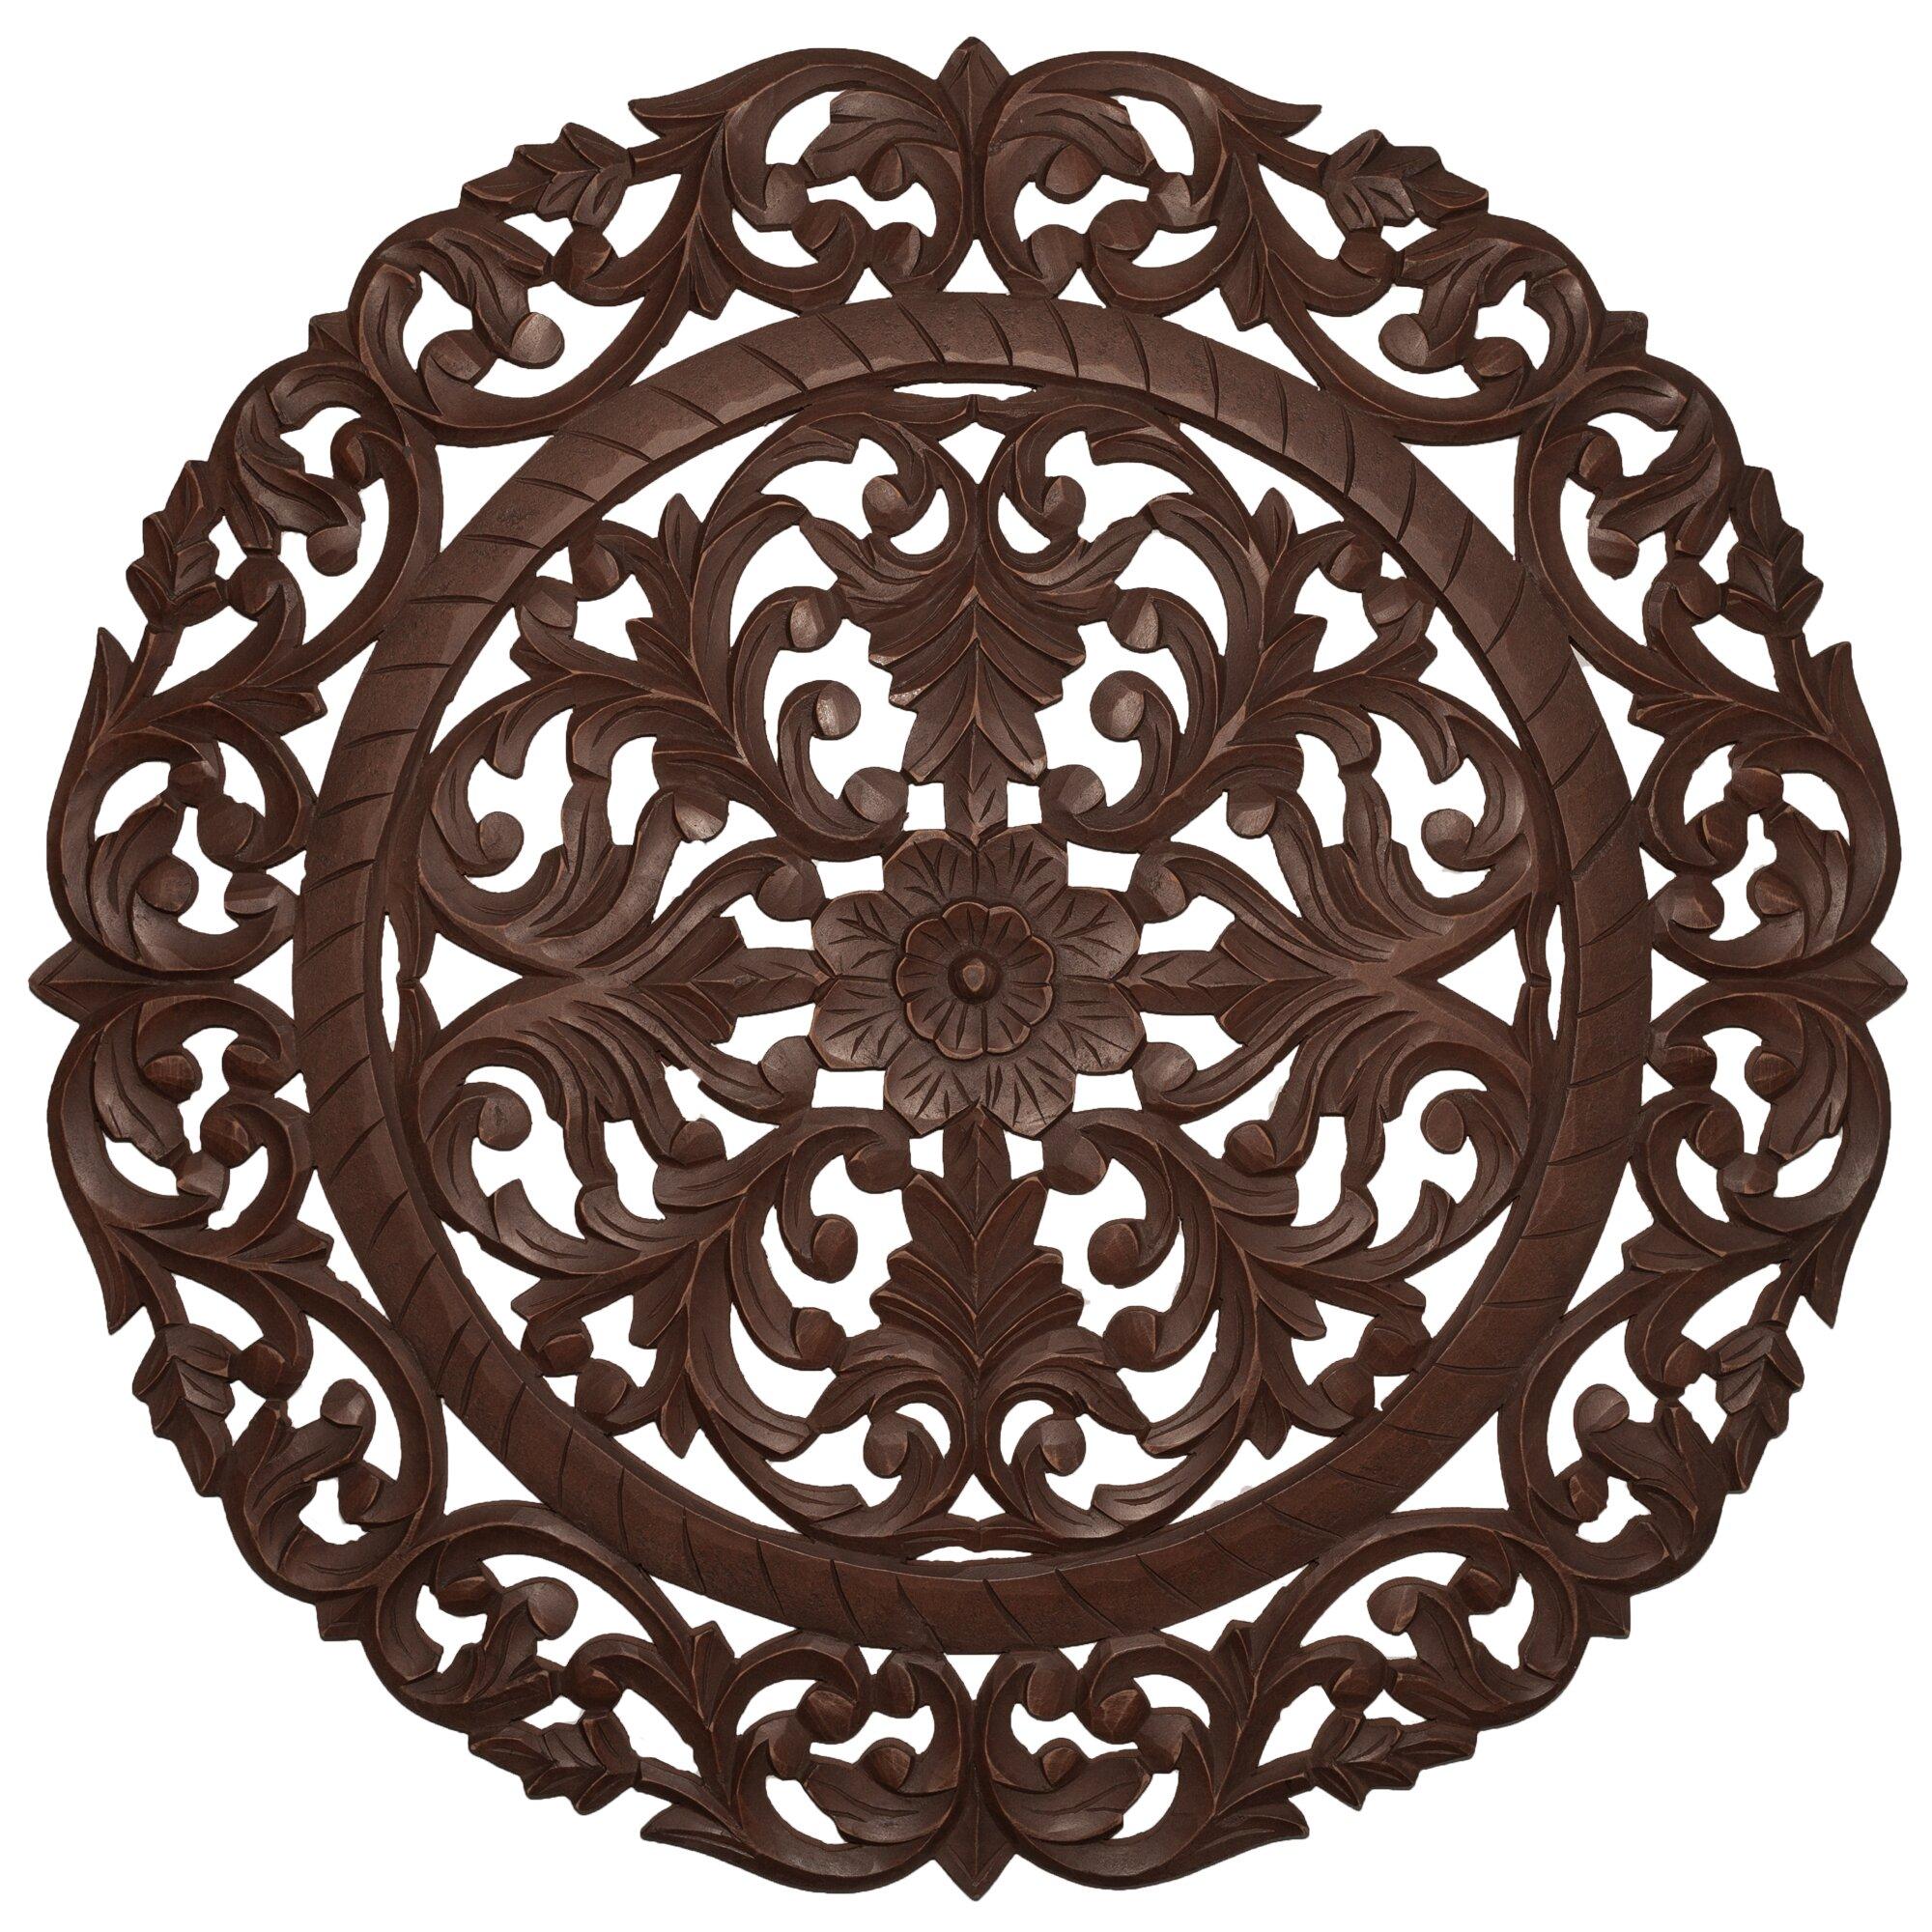 Astoria Grand Handcrafted Medallion Wall Décor & Reviews ...